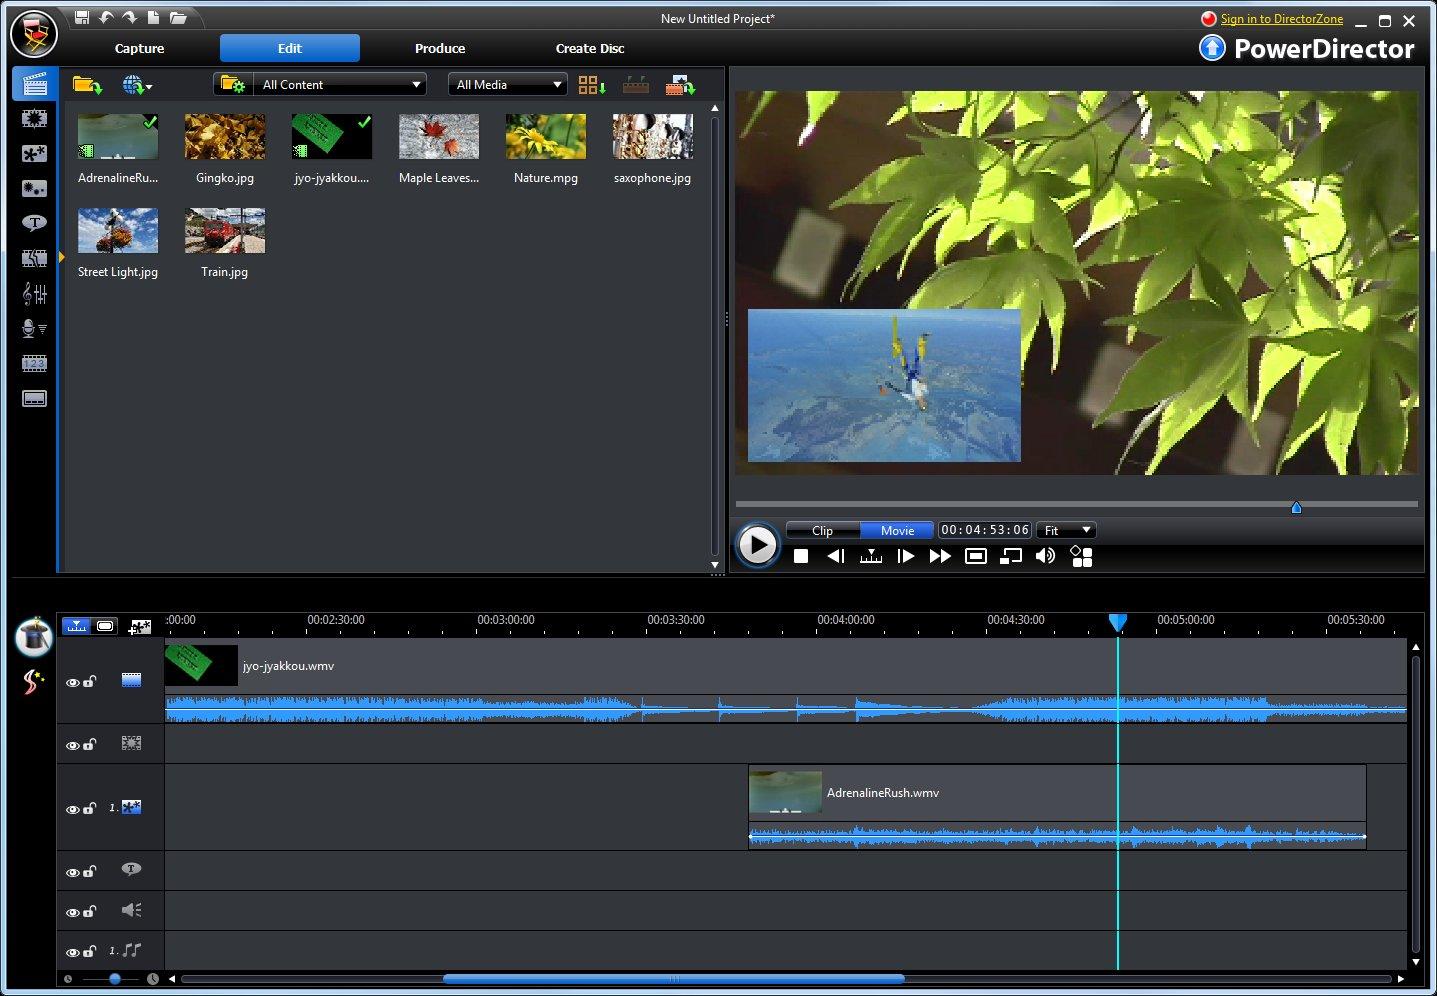 CyberLink PowerDirector - střih a práce s videem